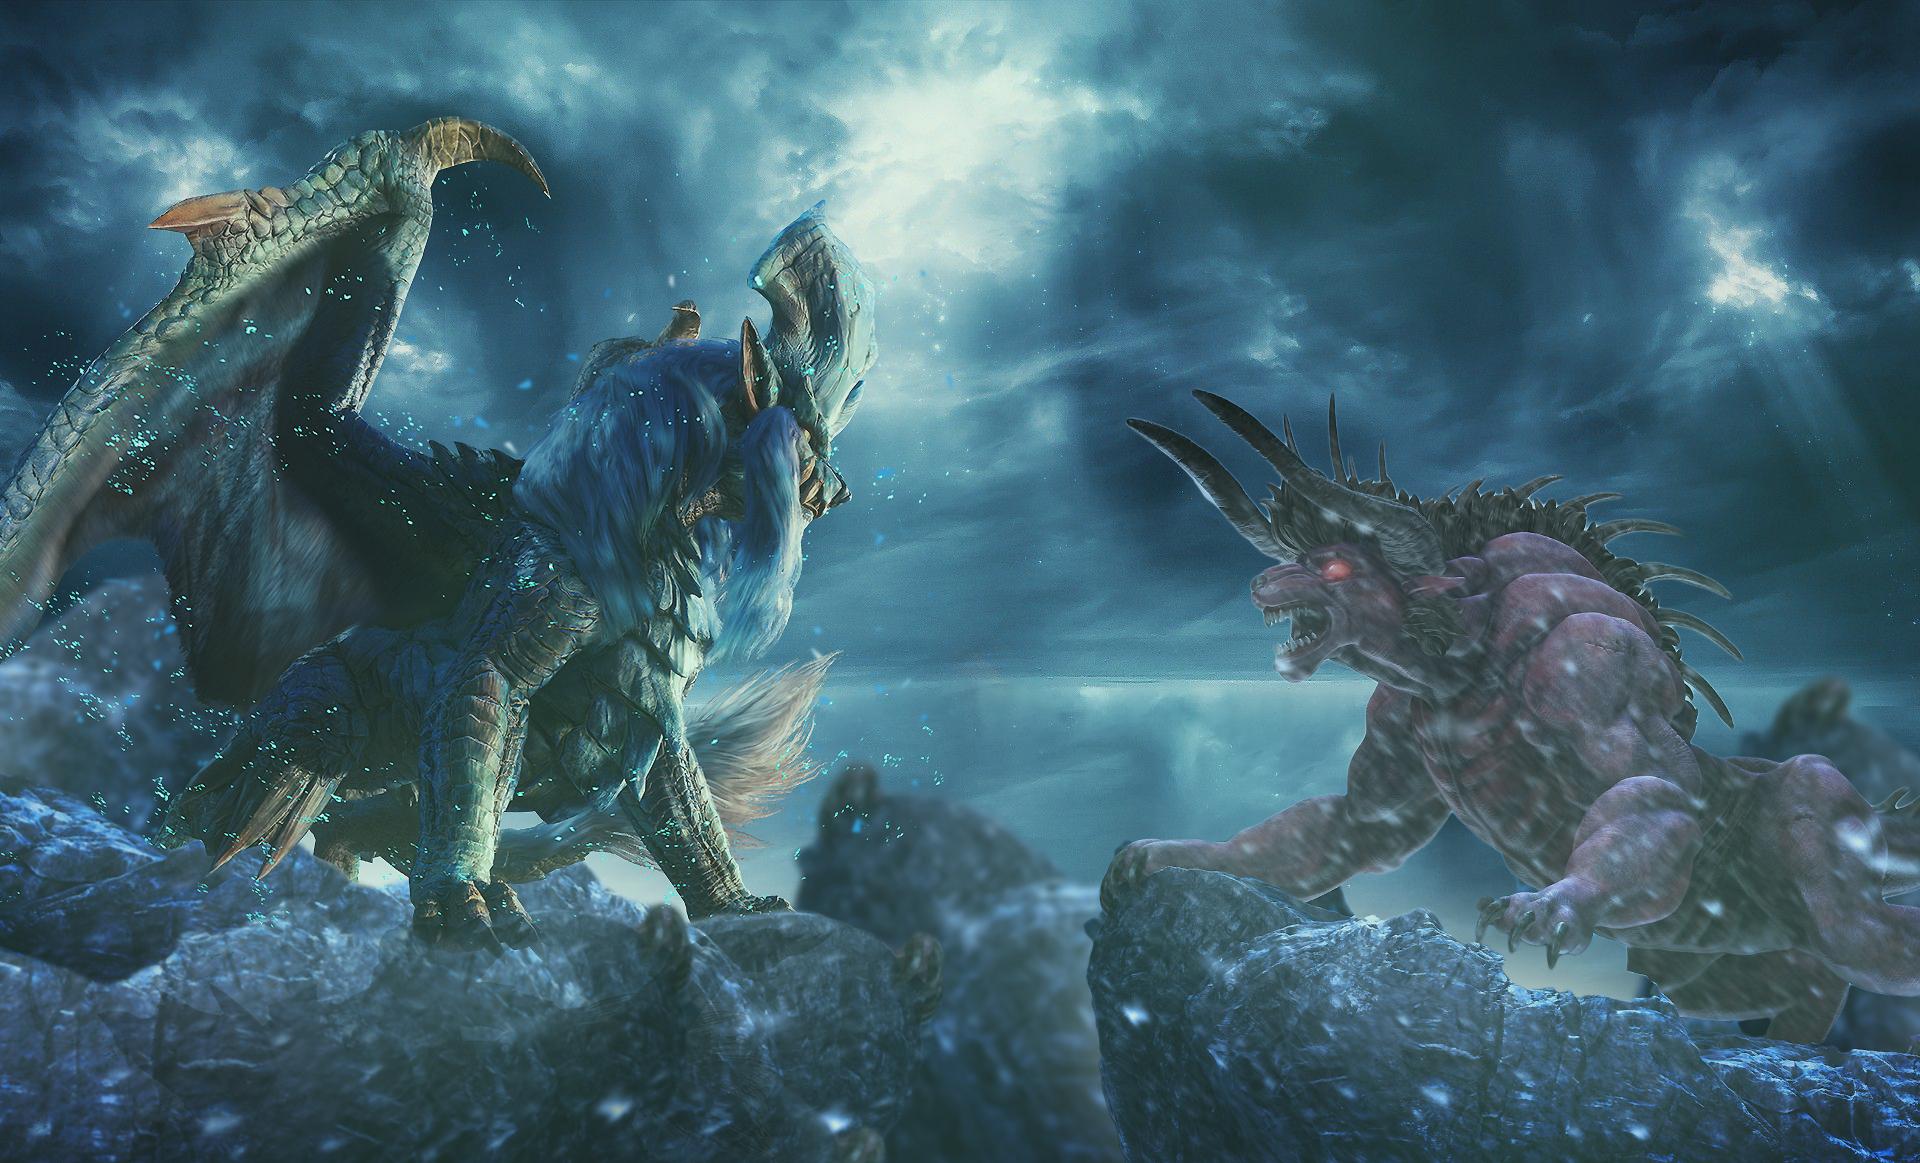 Monster Hunter World Behemoth Wallpapers Wallpaper Cave